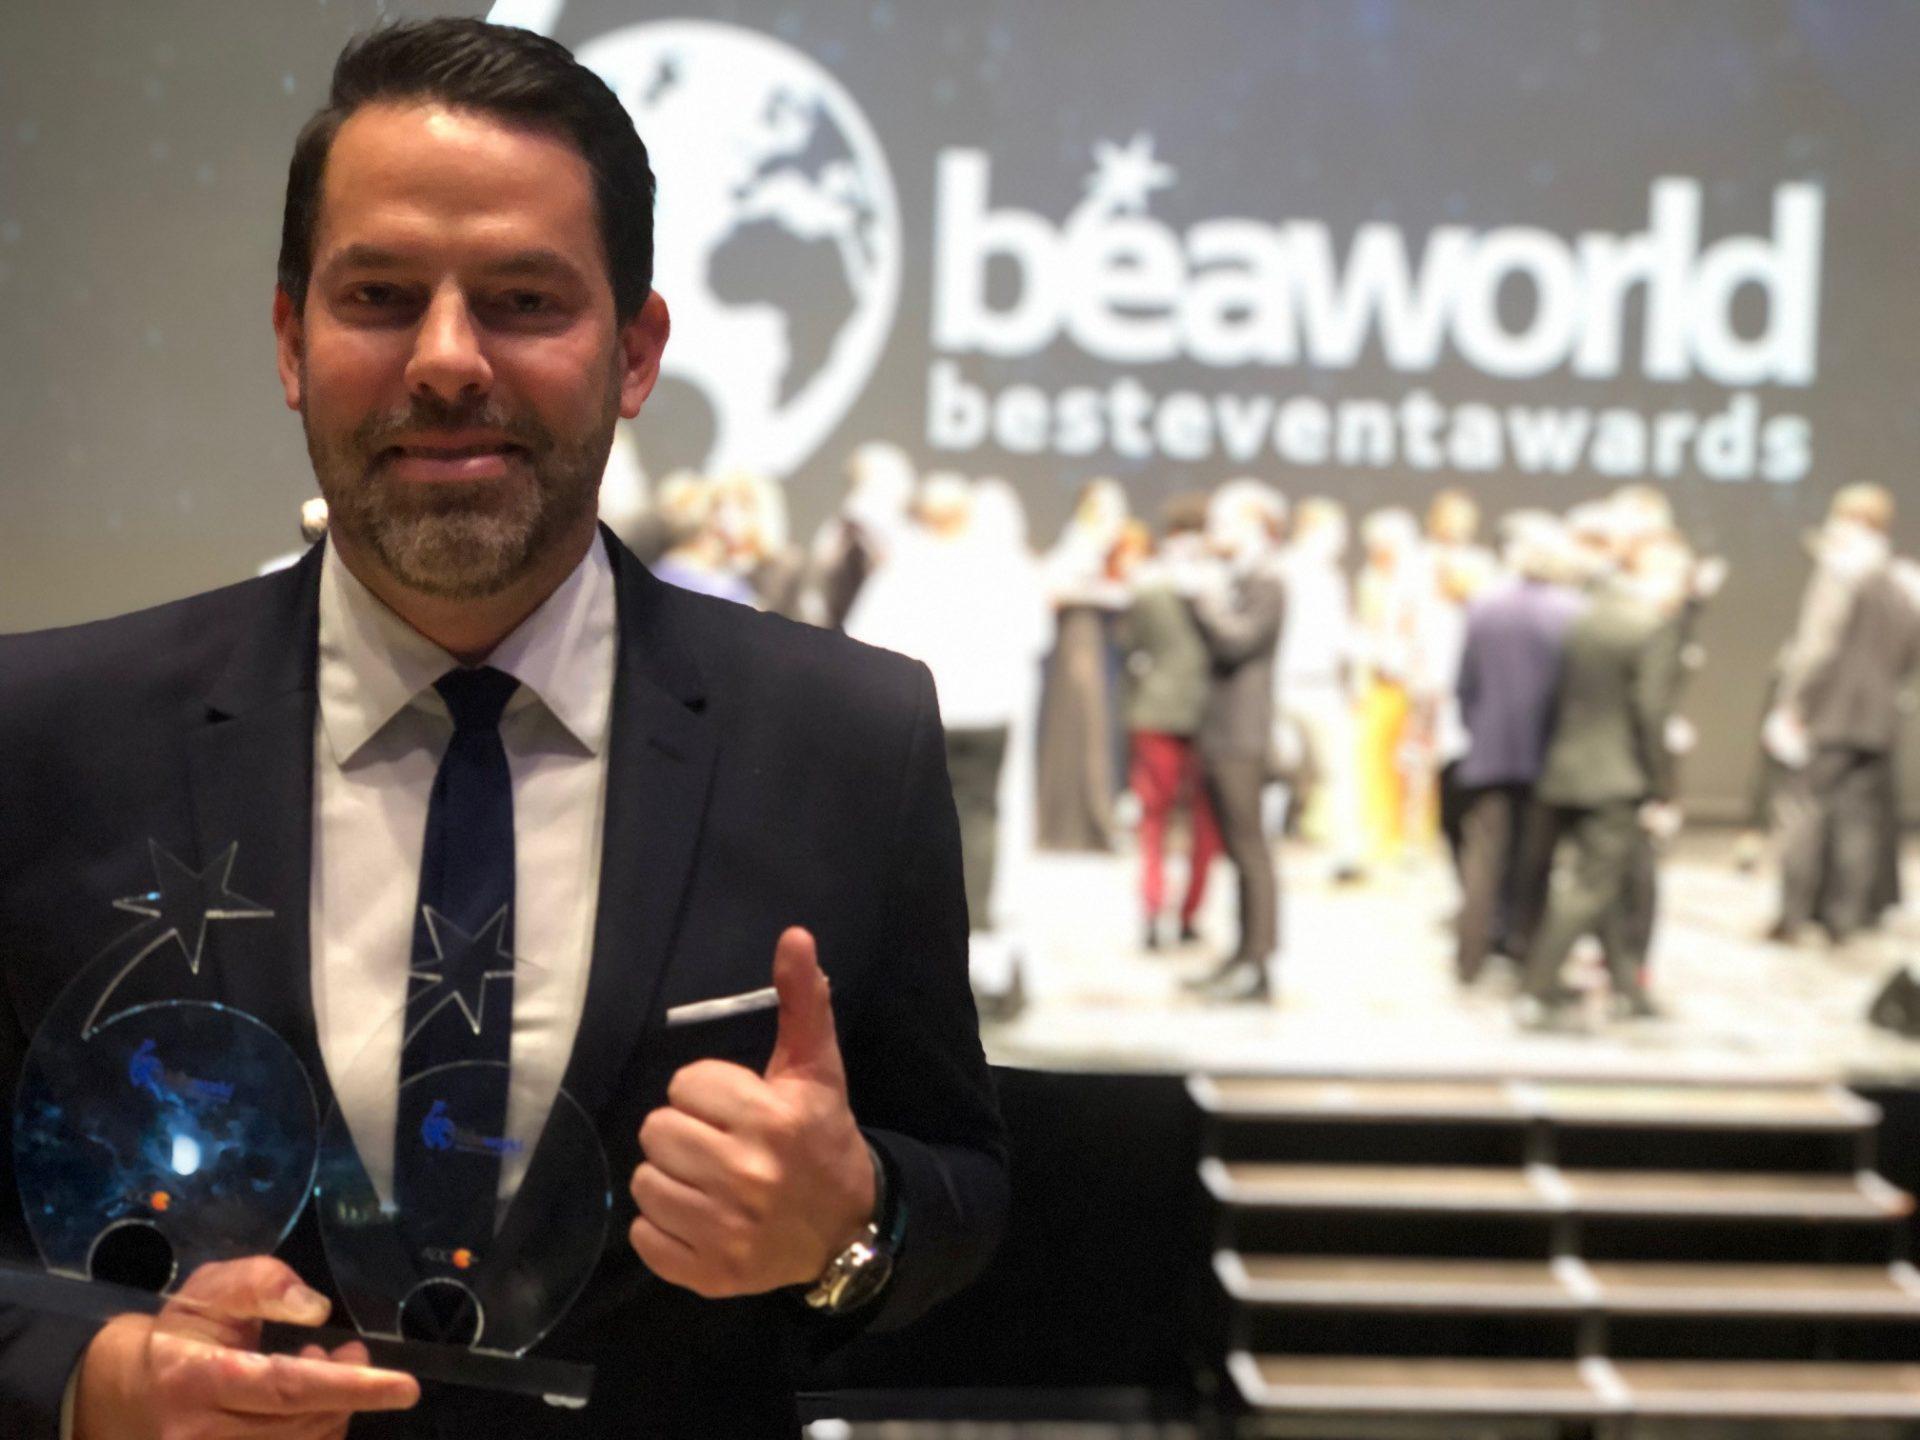 bea awards 2018